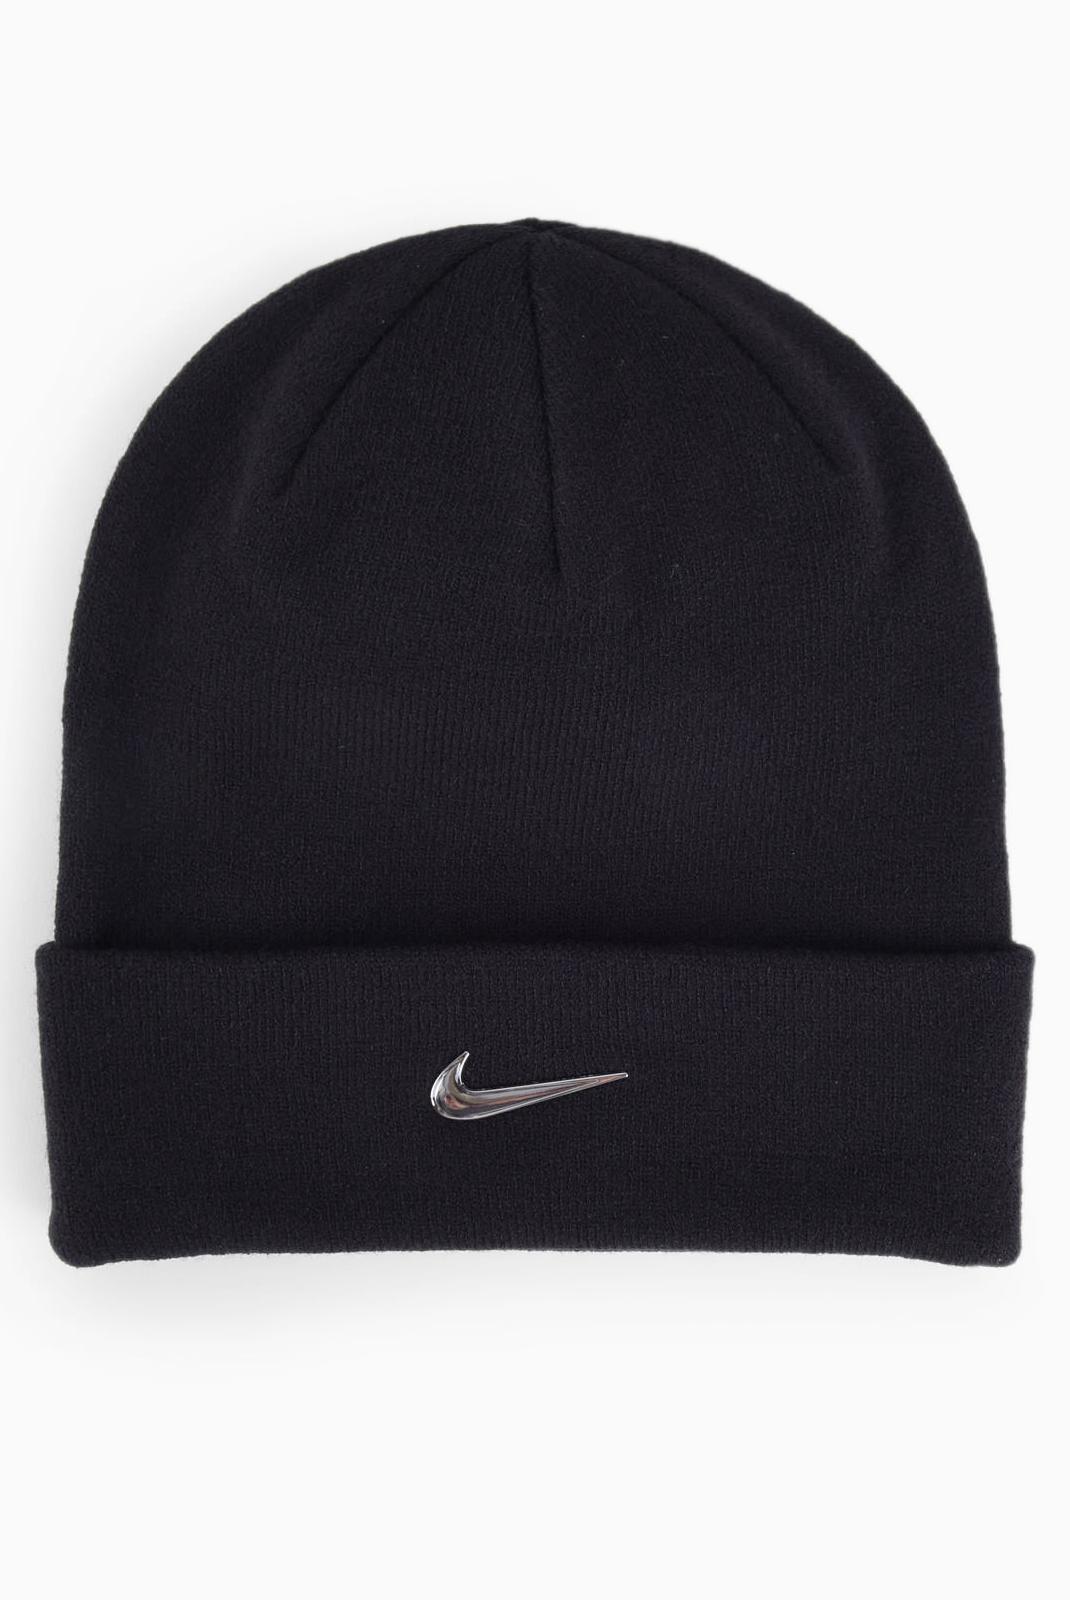 010 Nike Metal Swoosh Bonnets 825577 Black Beanie Casquettes Homme 6FnOvqWA7 453438c6784